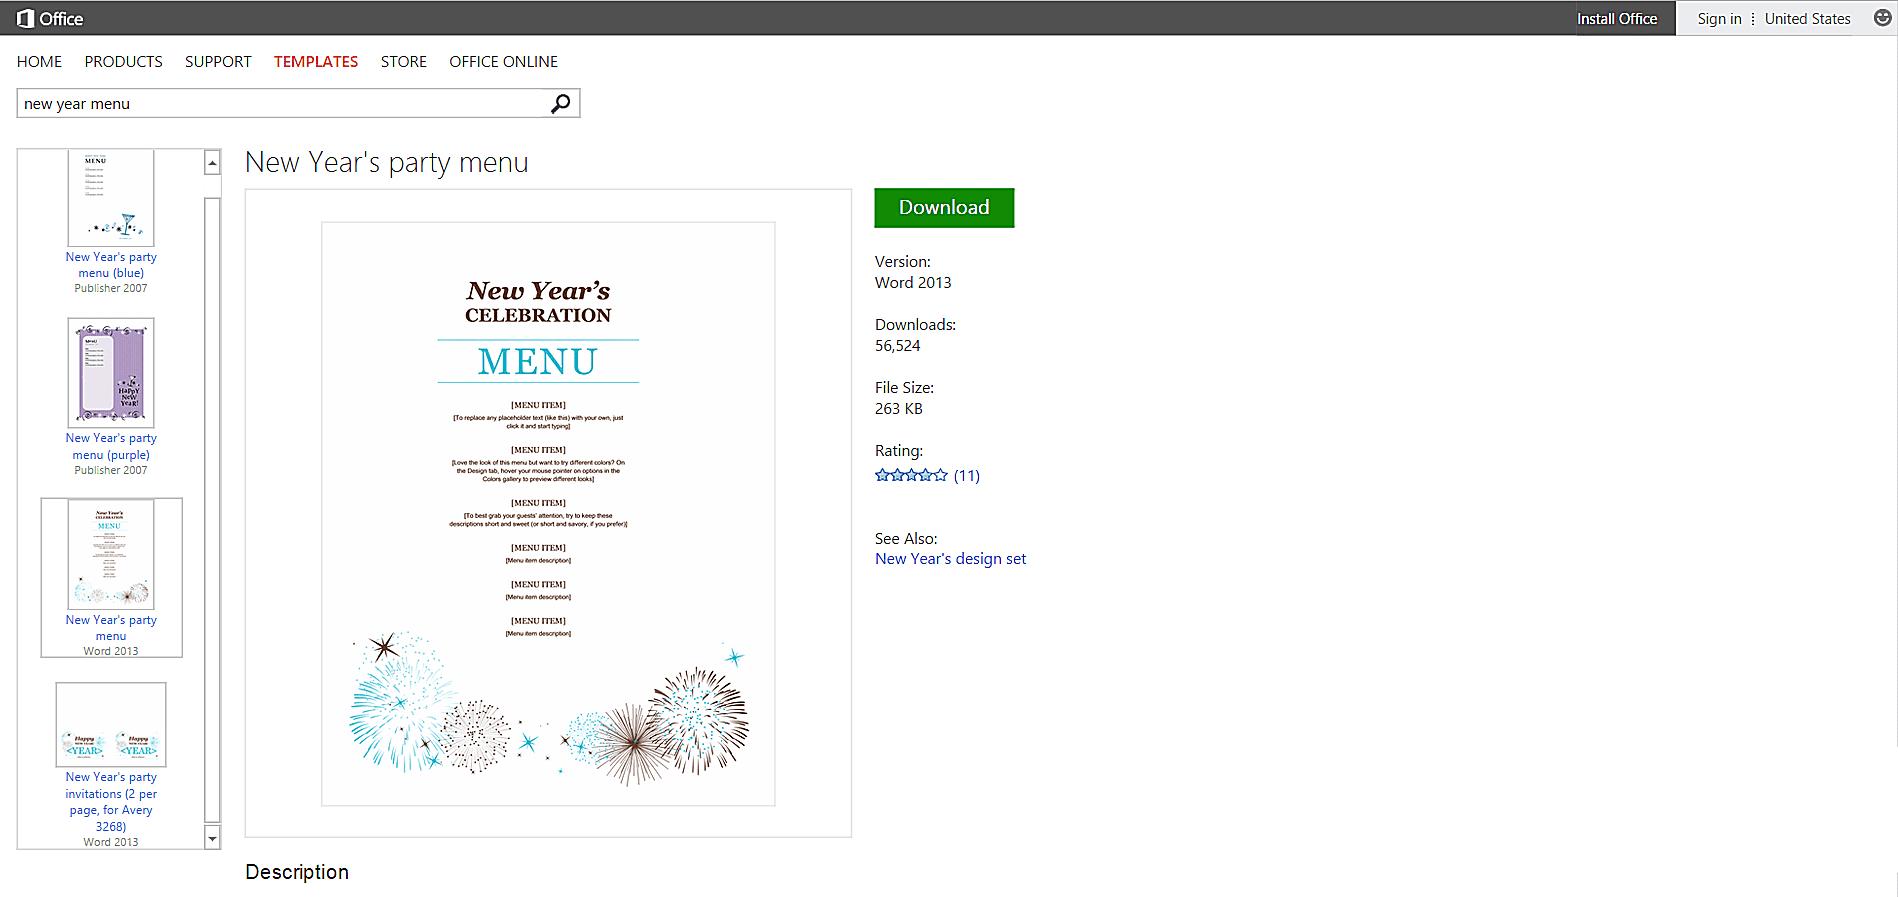 new year fireworks party menu template screenshot